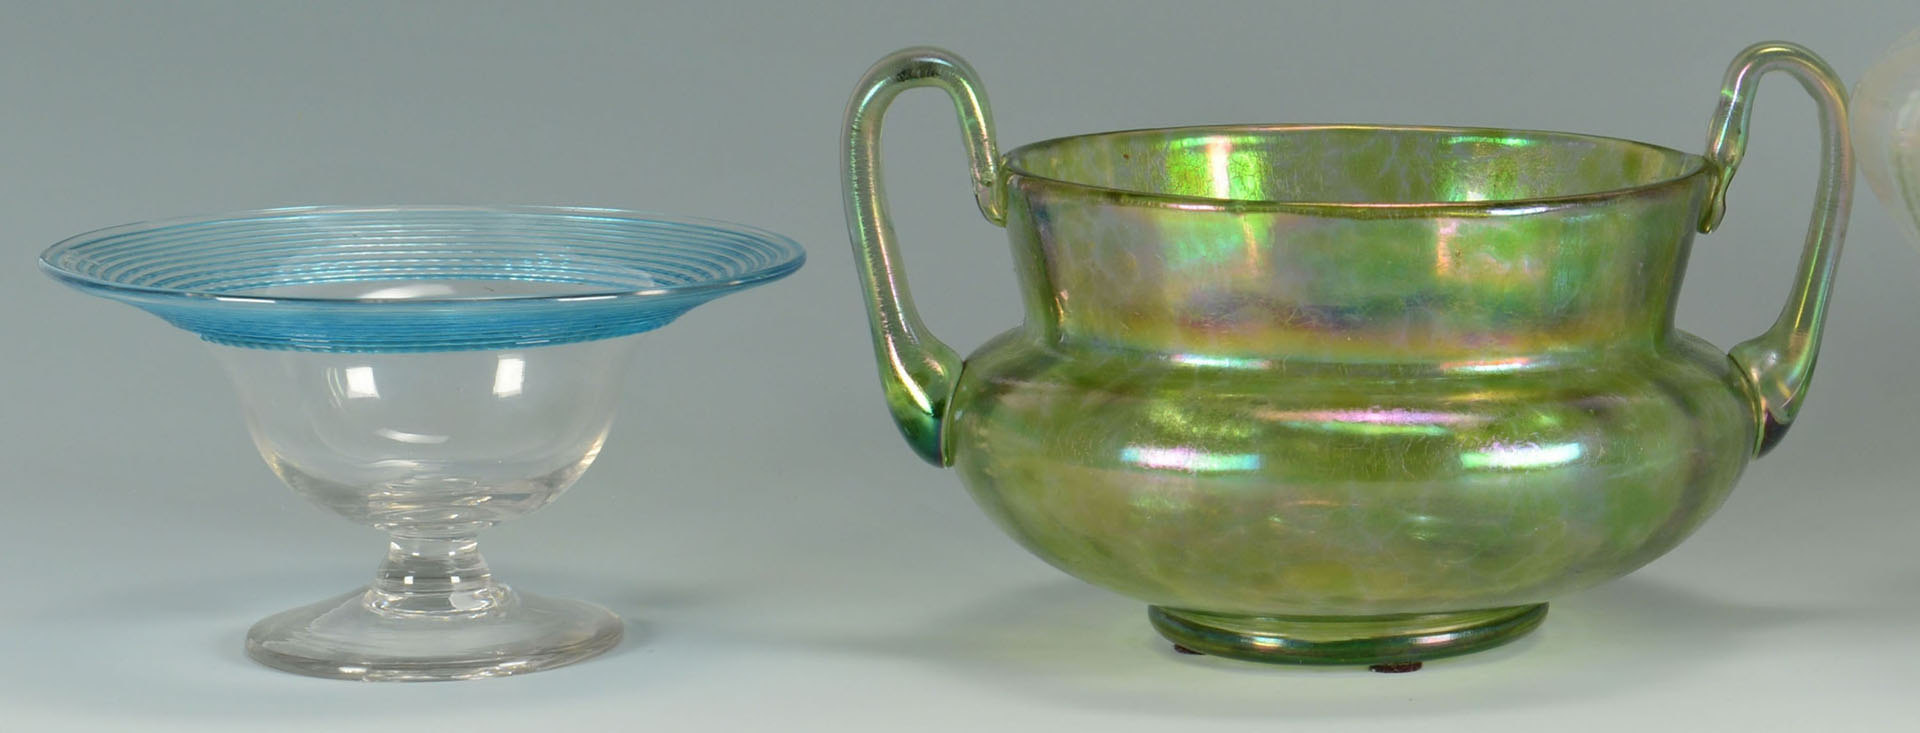 Lot 507: 4 Loetz Type Art Glass Items